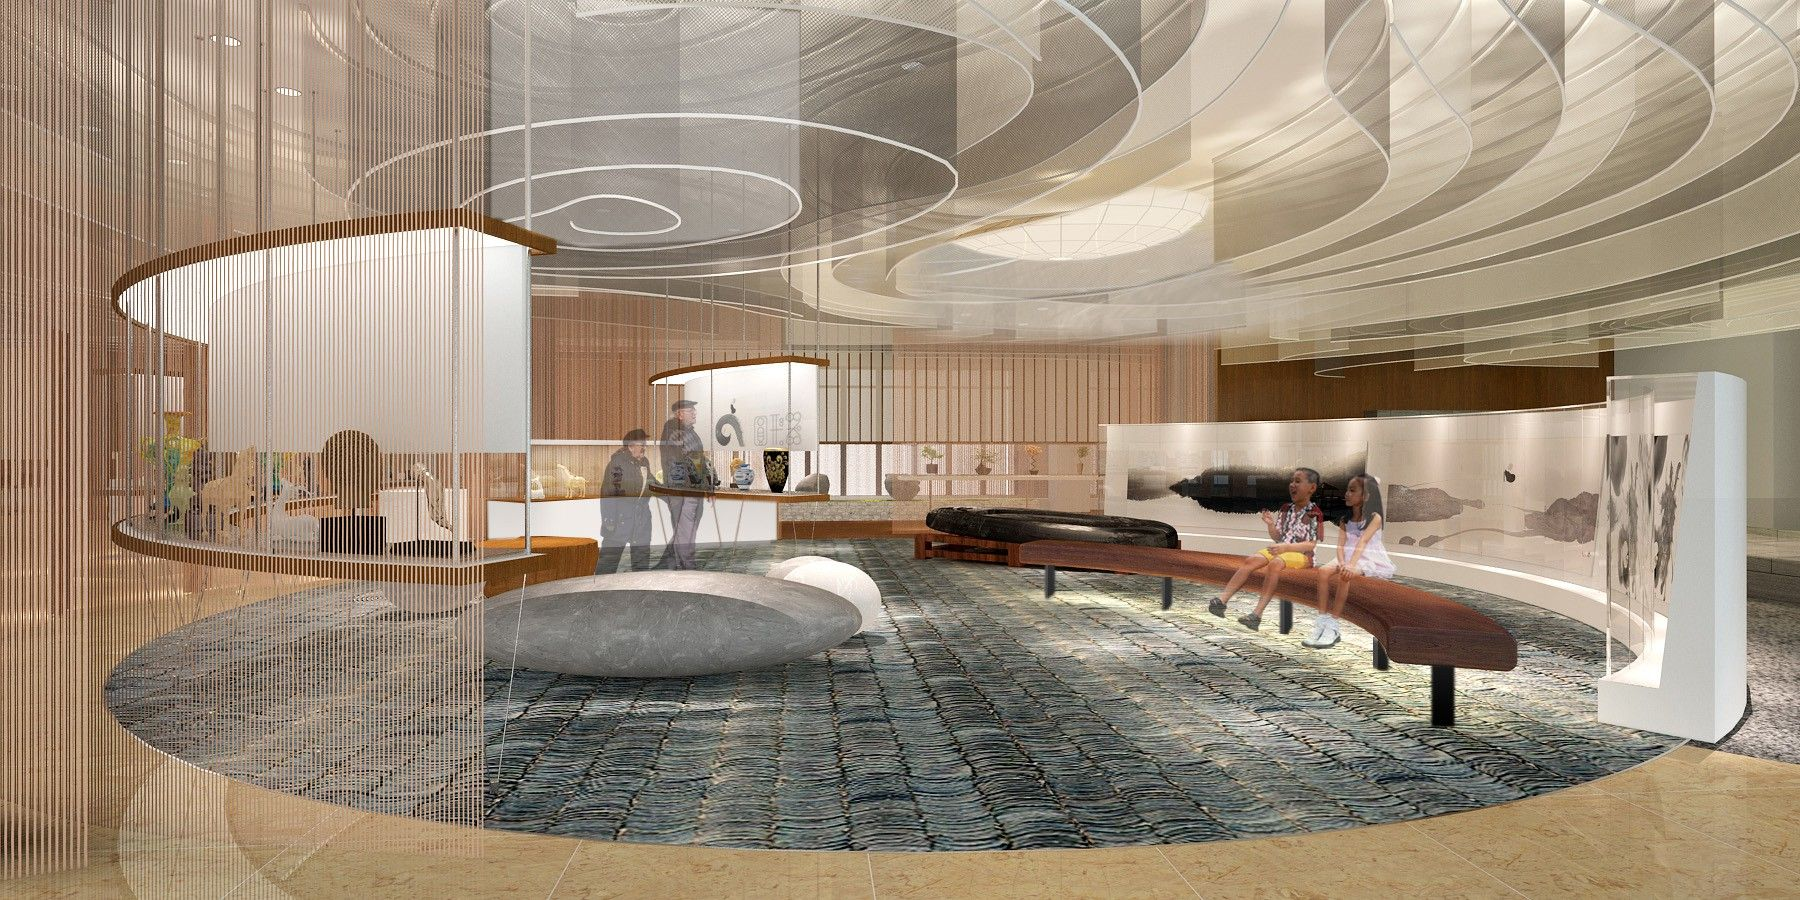 Architecture Interior Design Office Space Interior Design Find